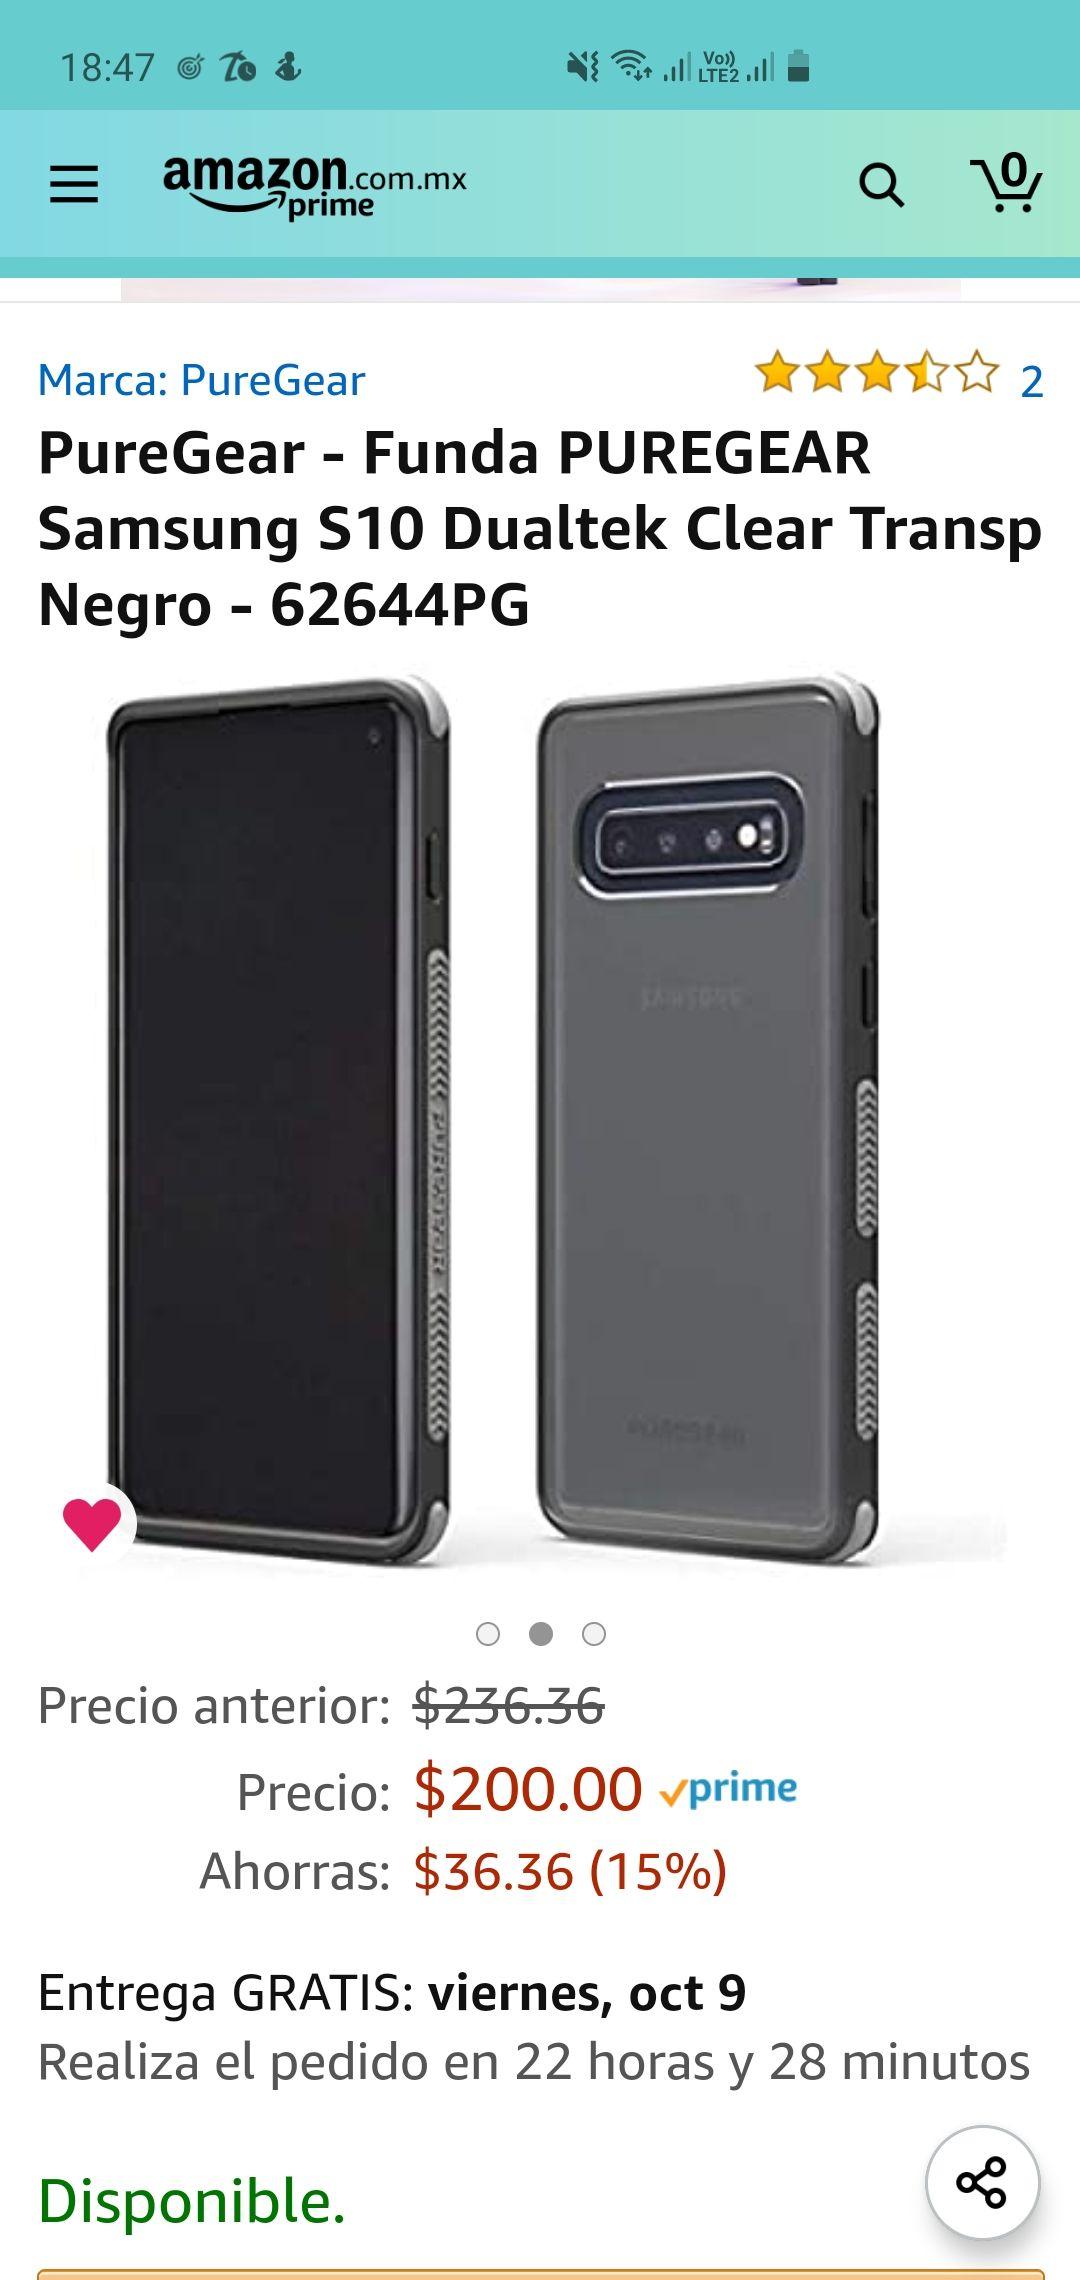 Amazon: funda Puregear Samsung S10